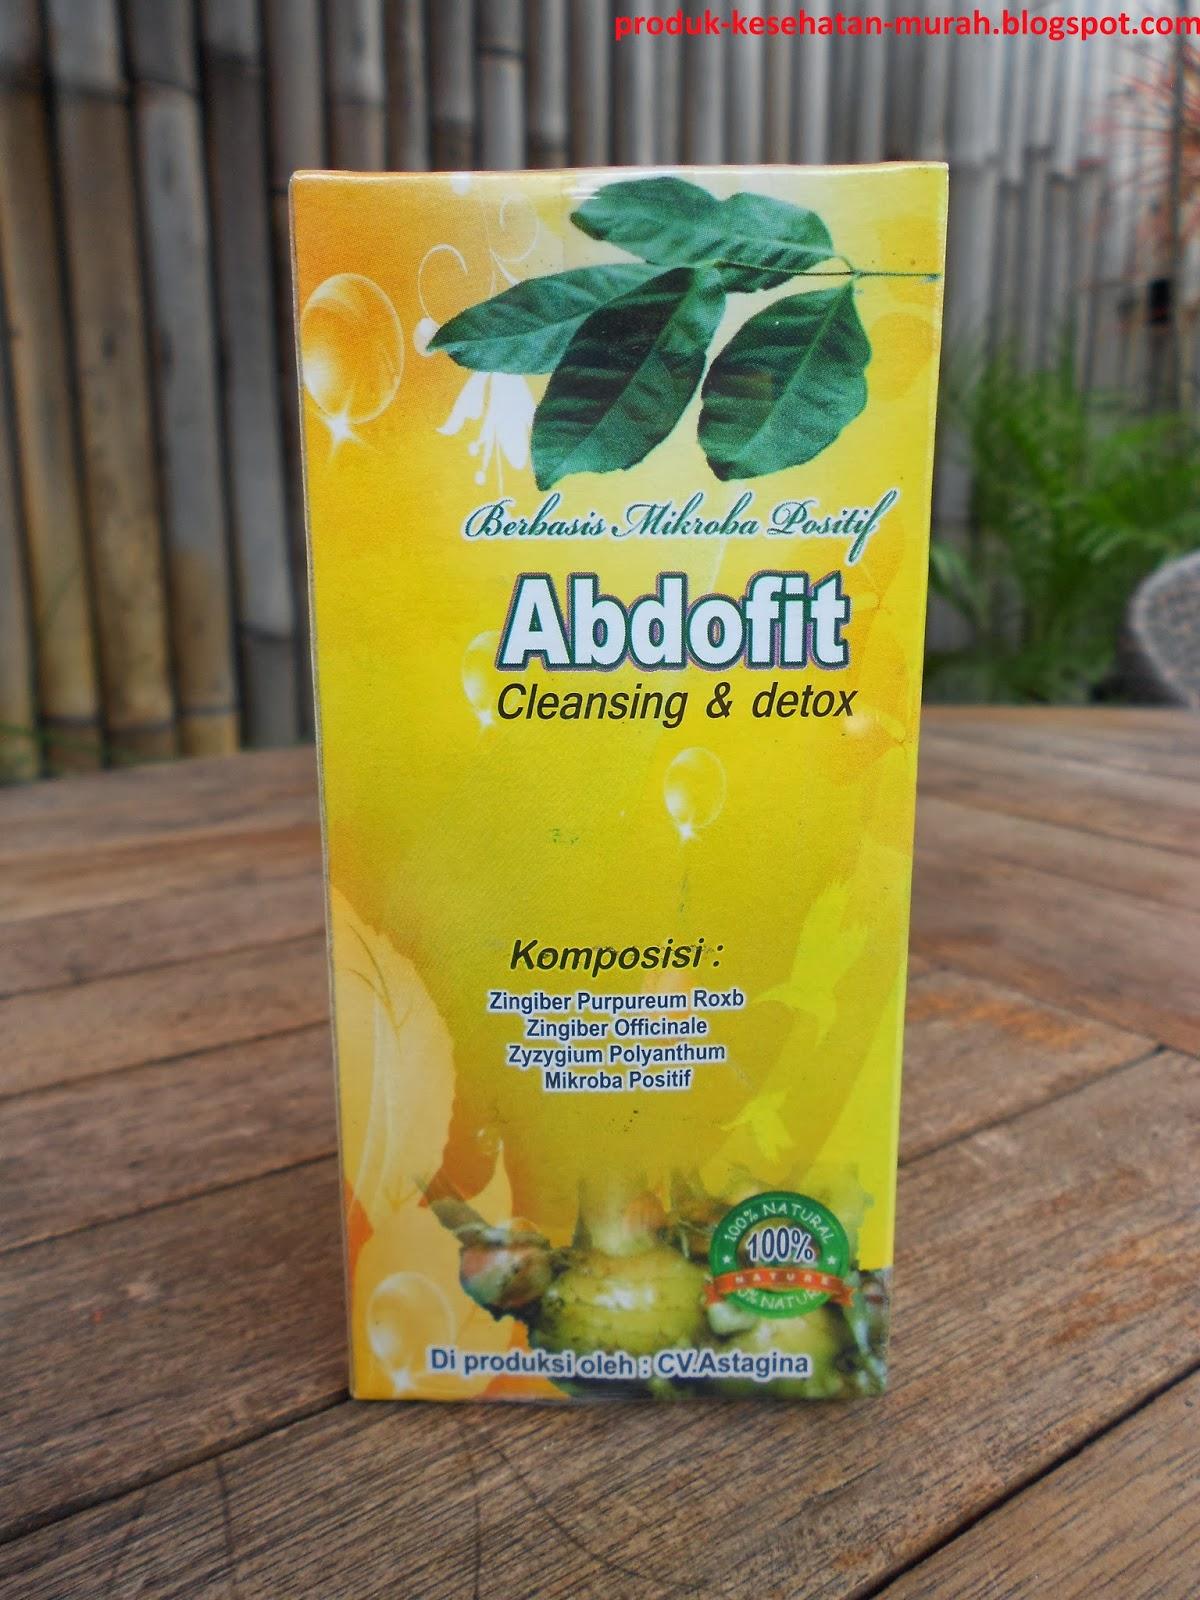 Antioksidan terbaik